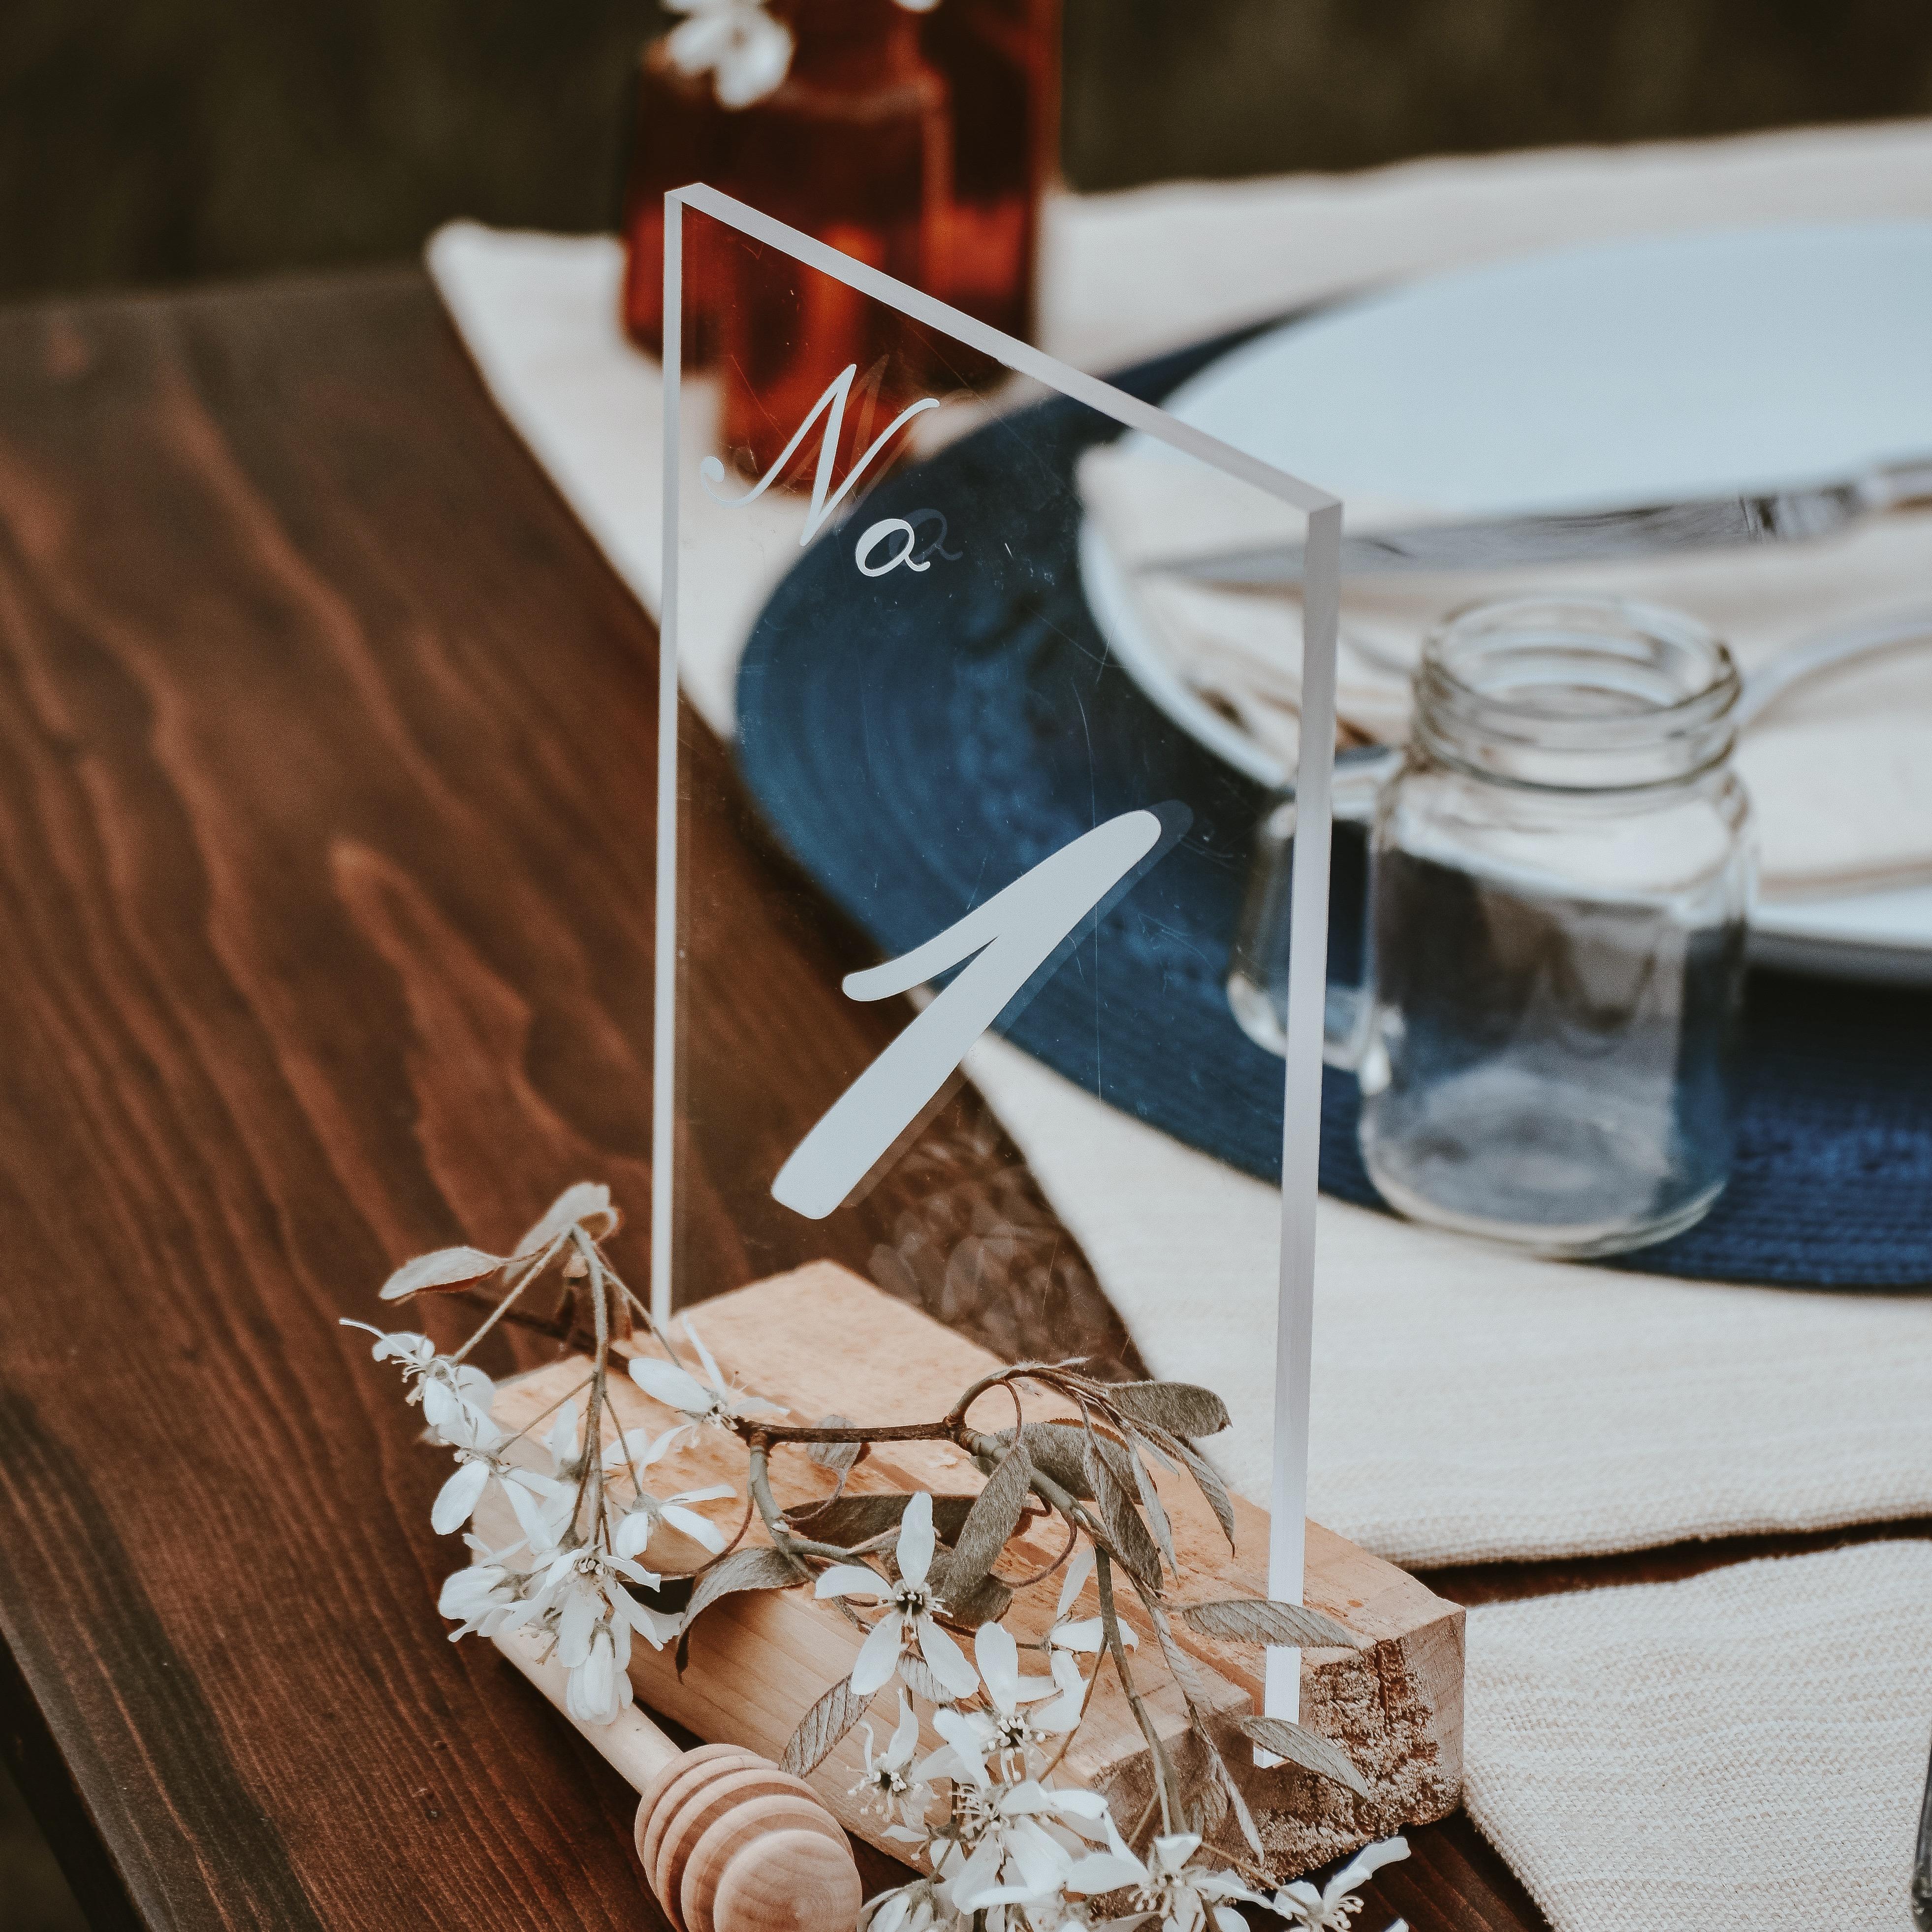 déco mariage organisation décoration plan my day wedding planner haut doubs morteau pontarlier besancon 3